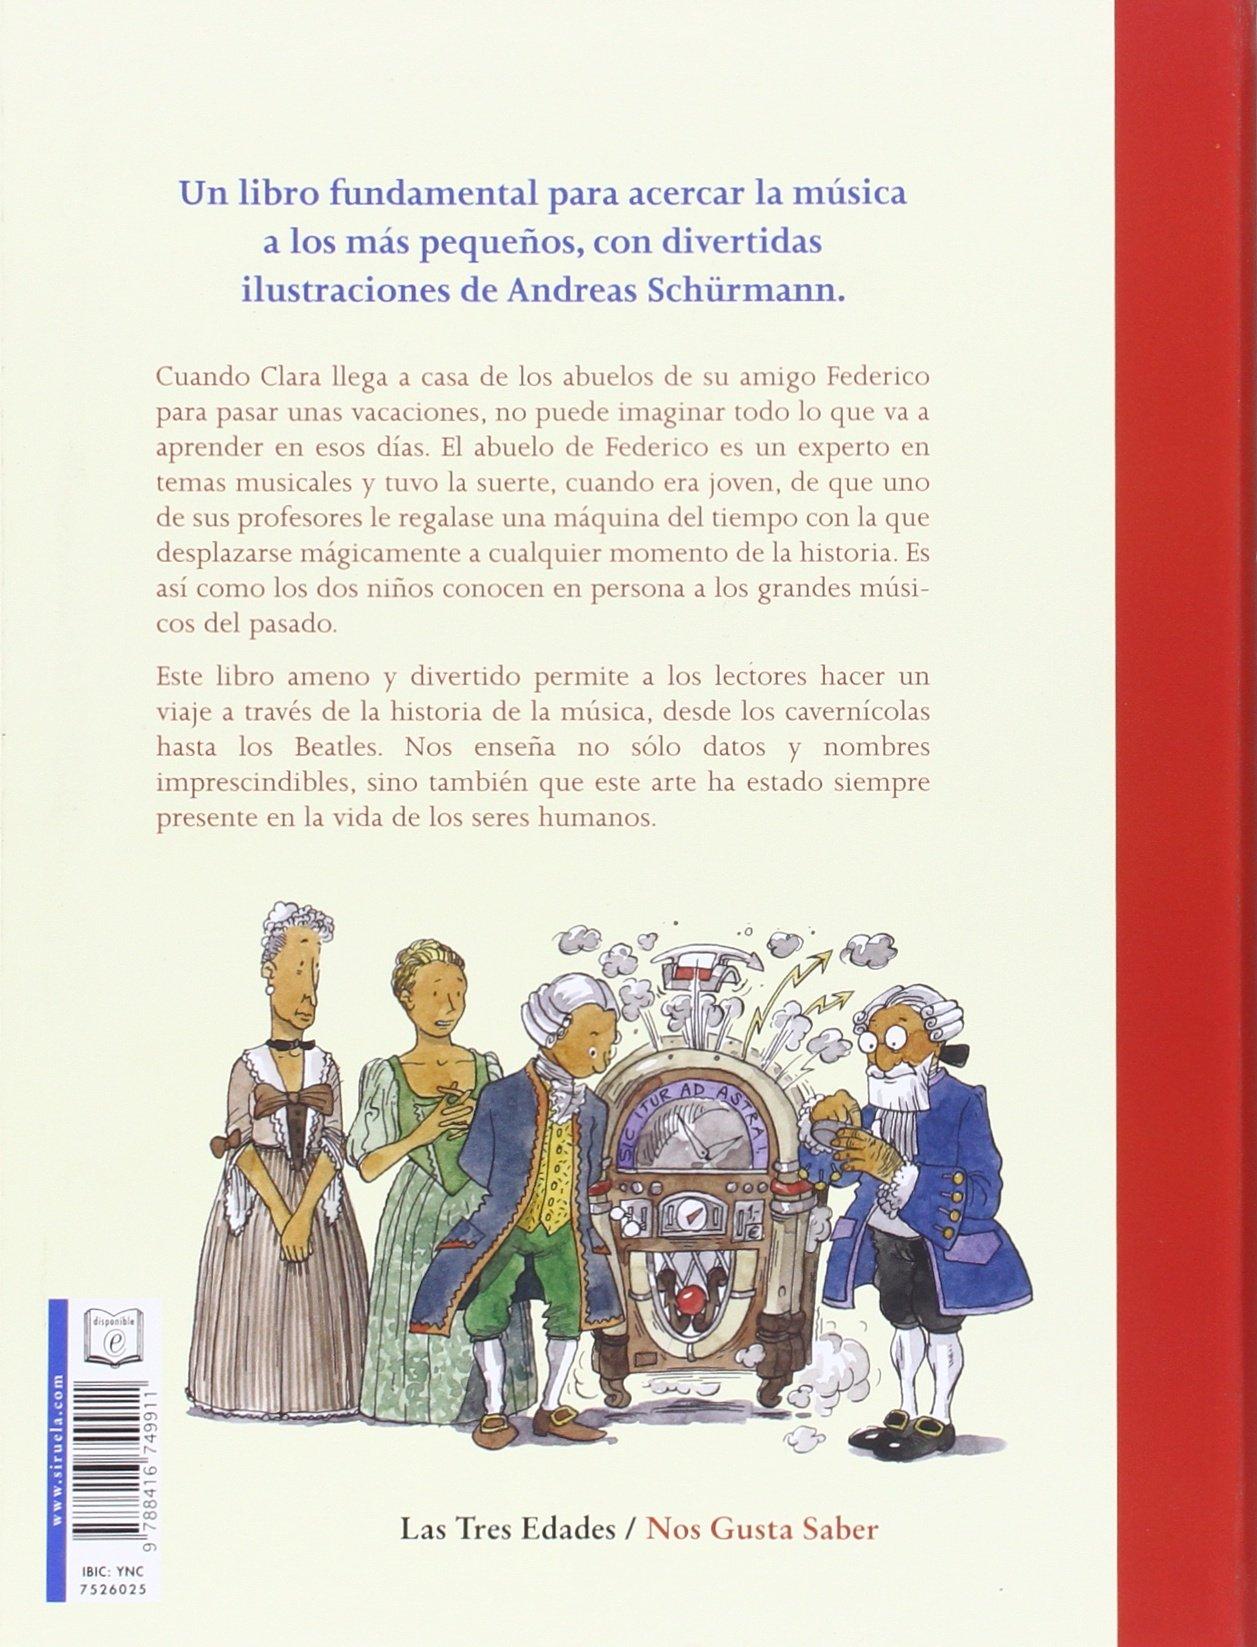 Historia De La Música Para Niños: Amazon.es: Monika Heumann, Hans-Günter Heumann, Andreas Schürmann, Luis Gago Badenas: Libros